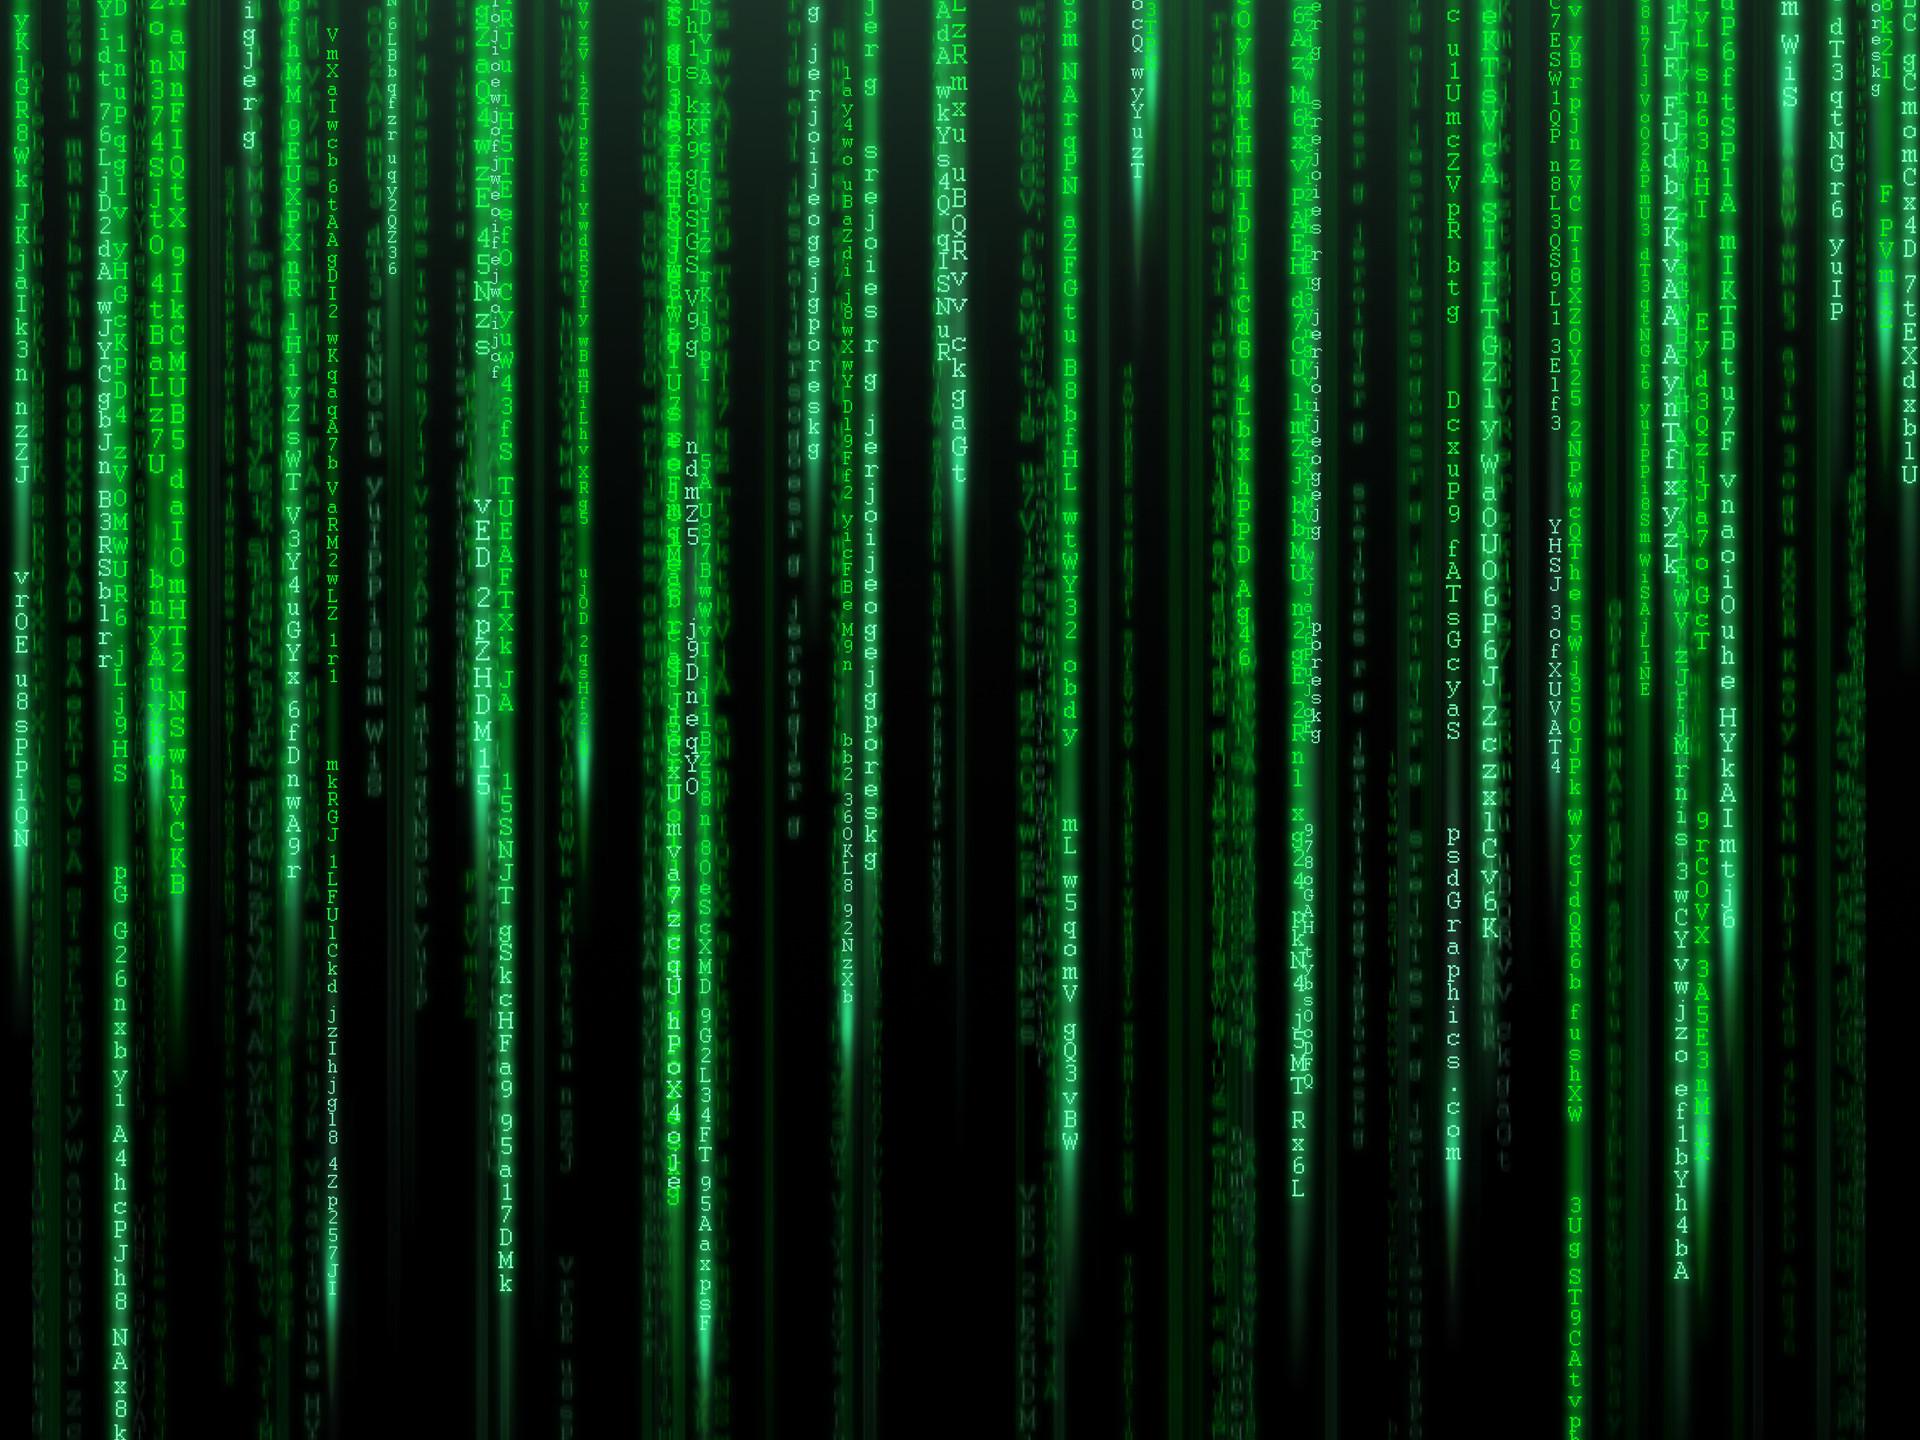 Matrix Binary Code Falling Wallpaper – WallpaperSafari